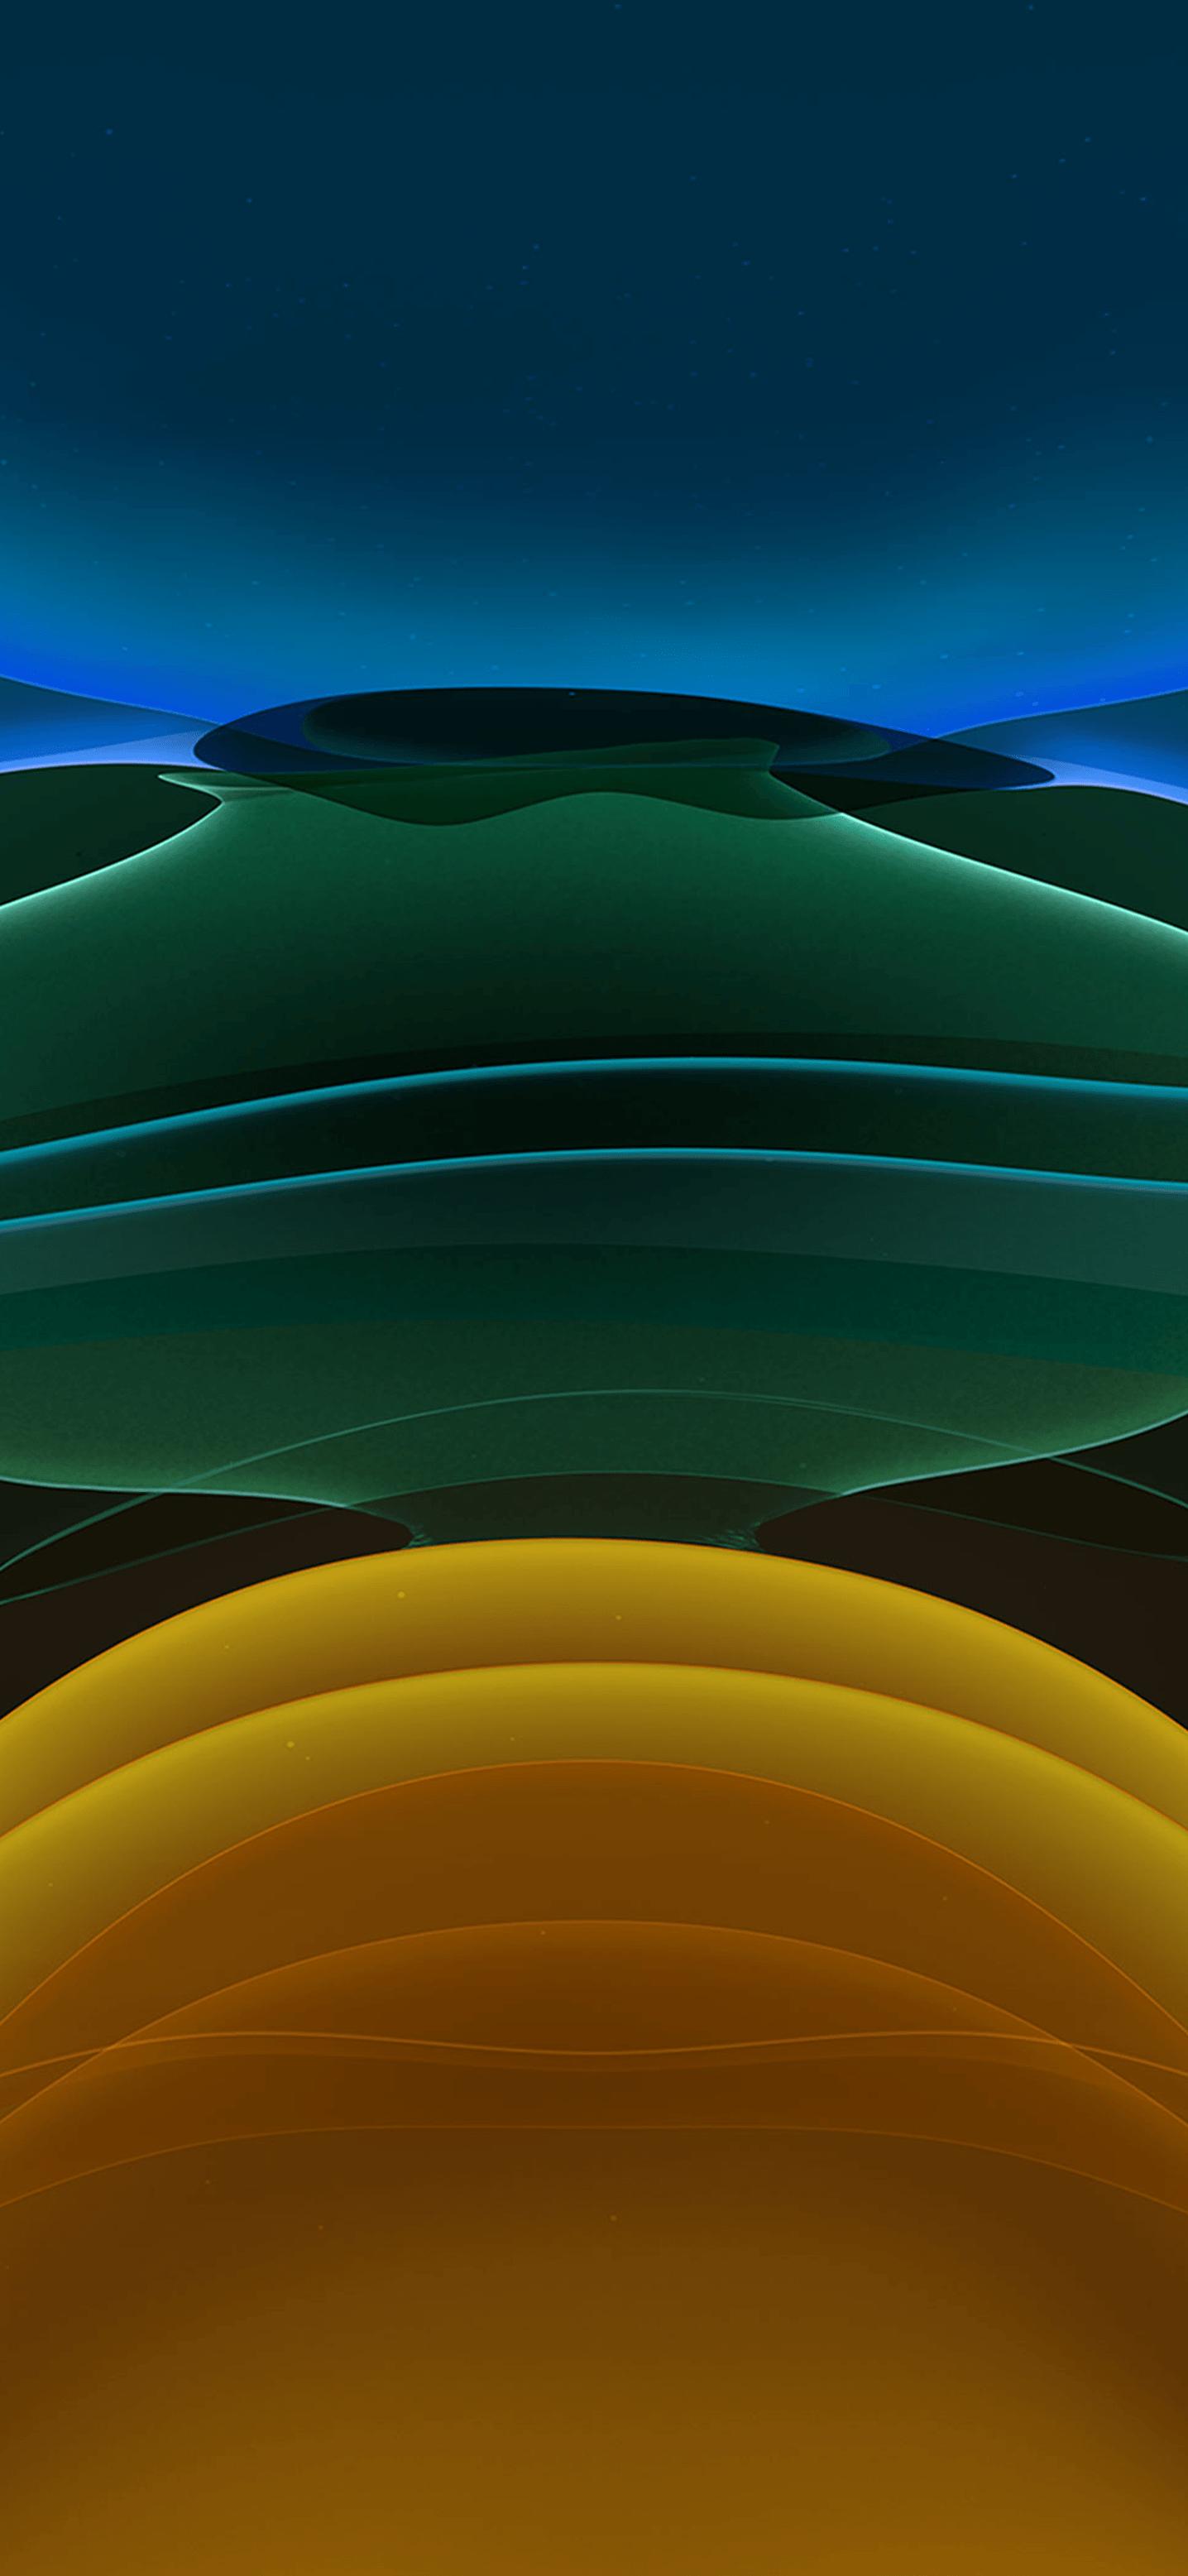 Iphone Wallpaper in 2020 New wallpaper iphone, Stock